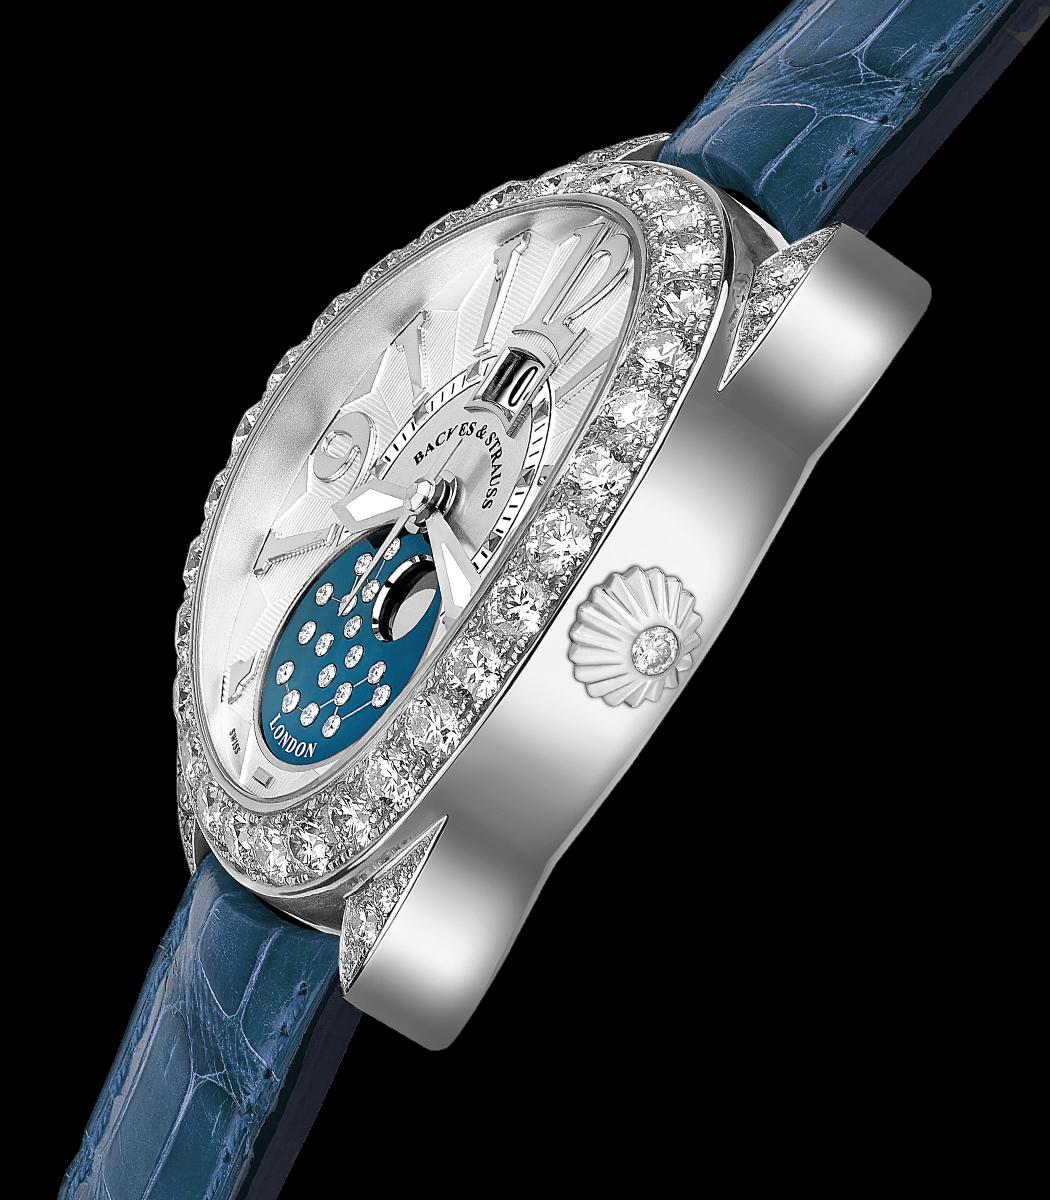 Regent 1609 AD 4047 limited edition diamond watch side-shot